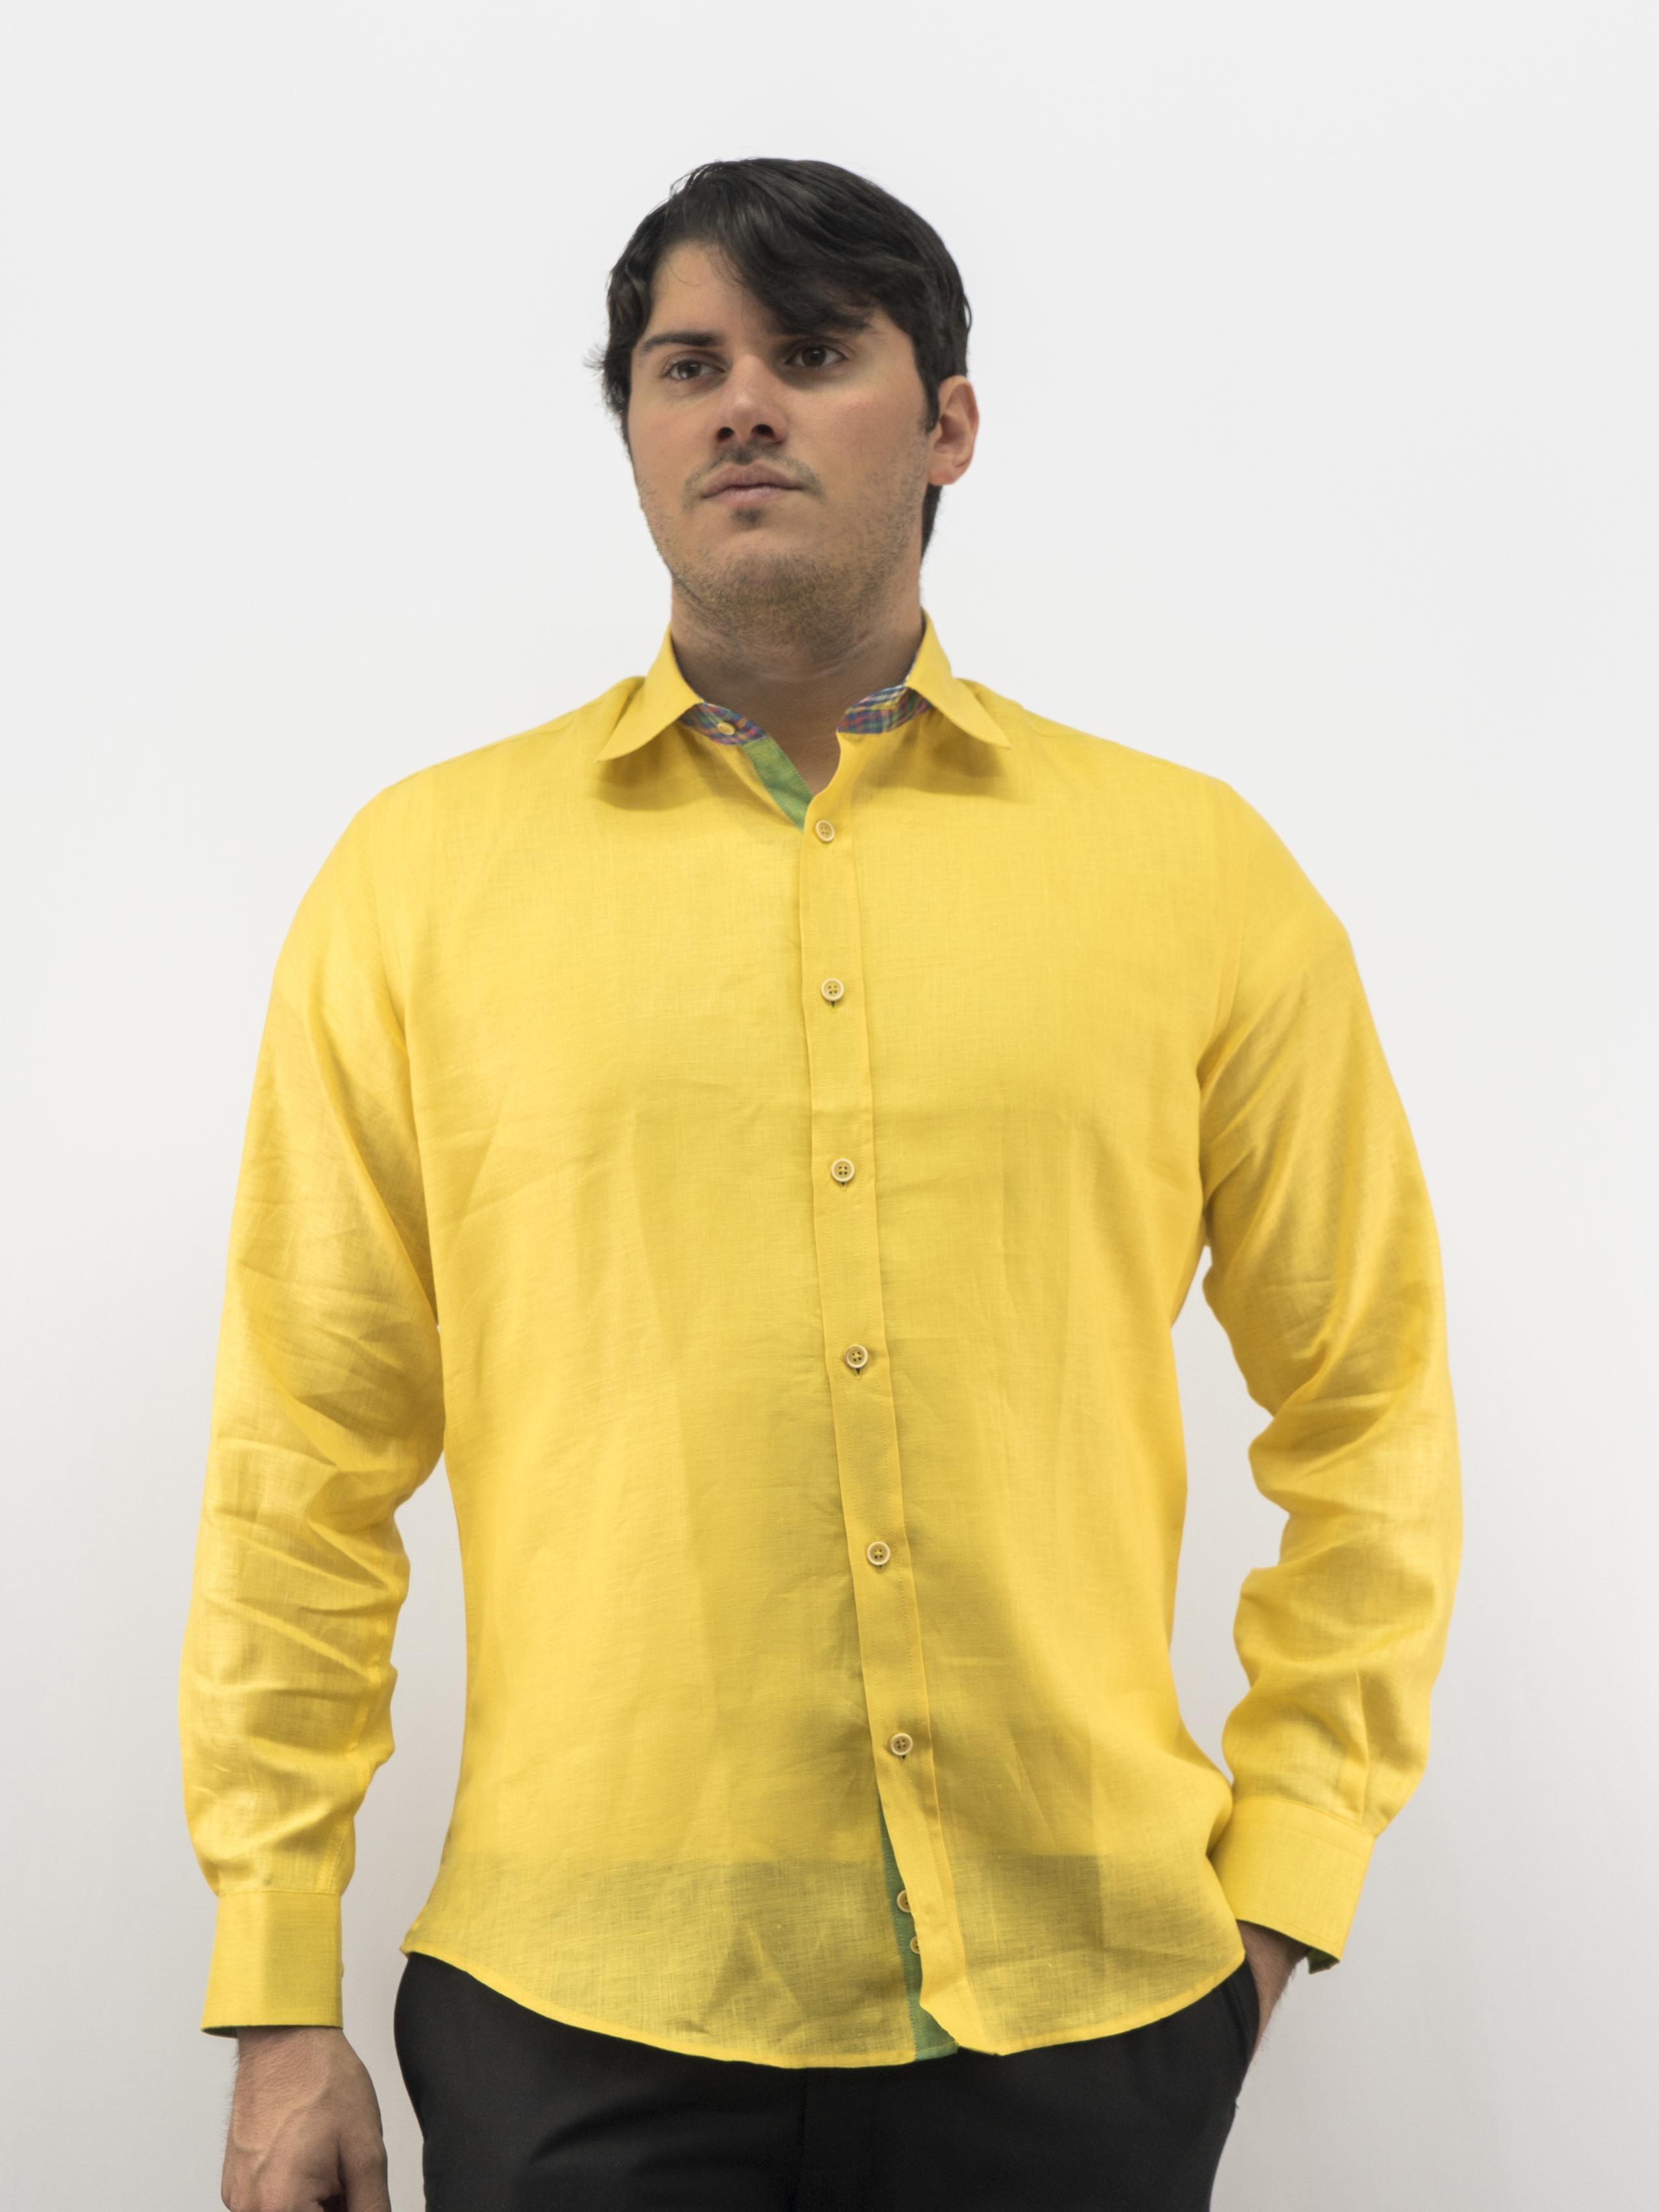 5d2b694dfee D Accord Men s Long Sleeve Shirt 100% Premium Linen Lime   4483 Last Medium